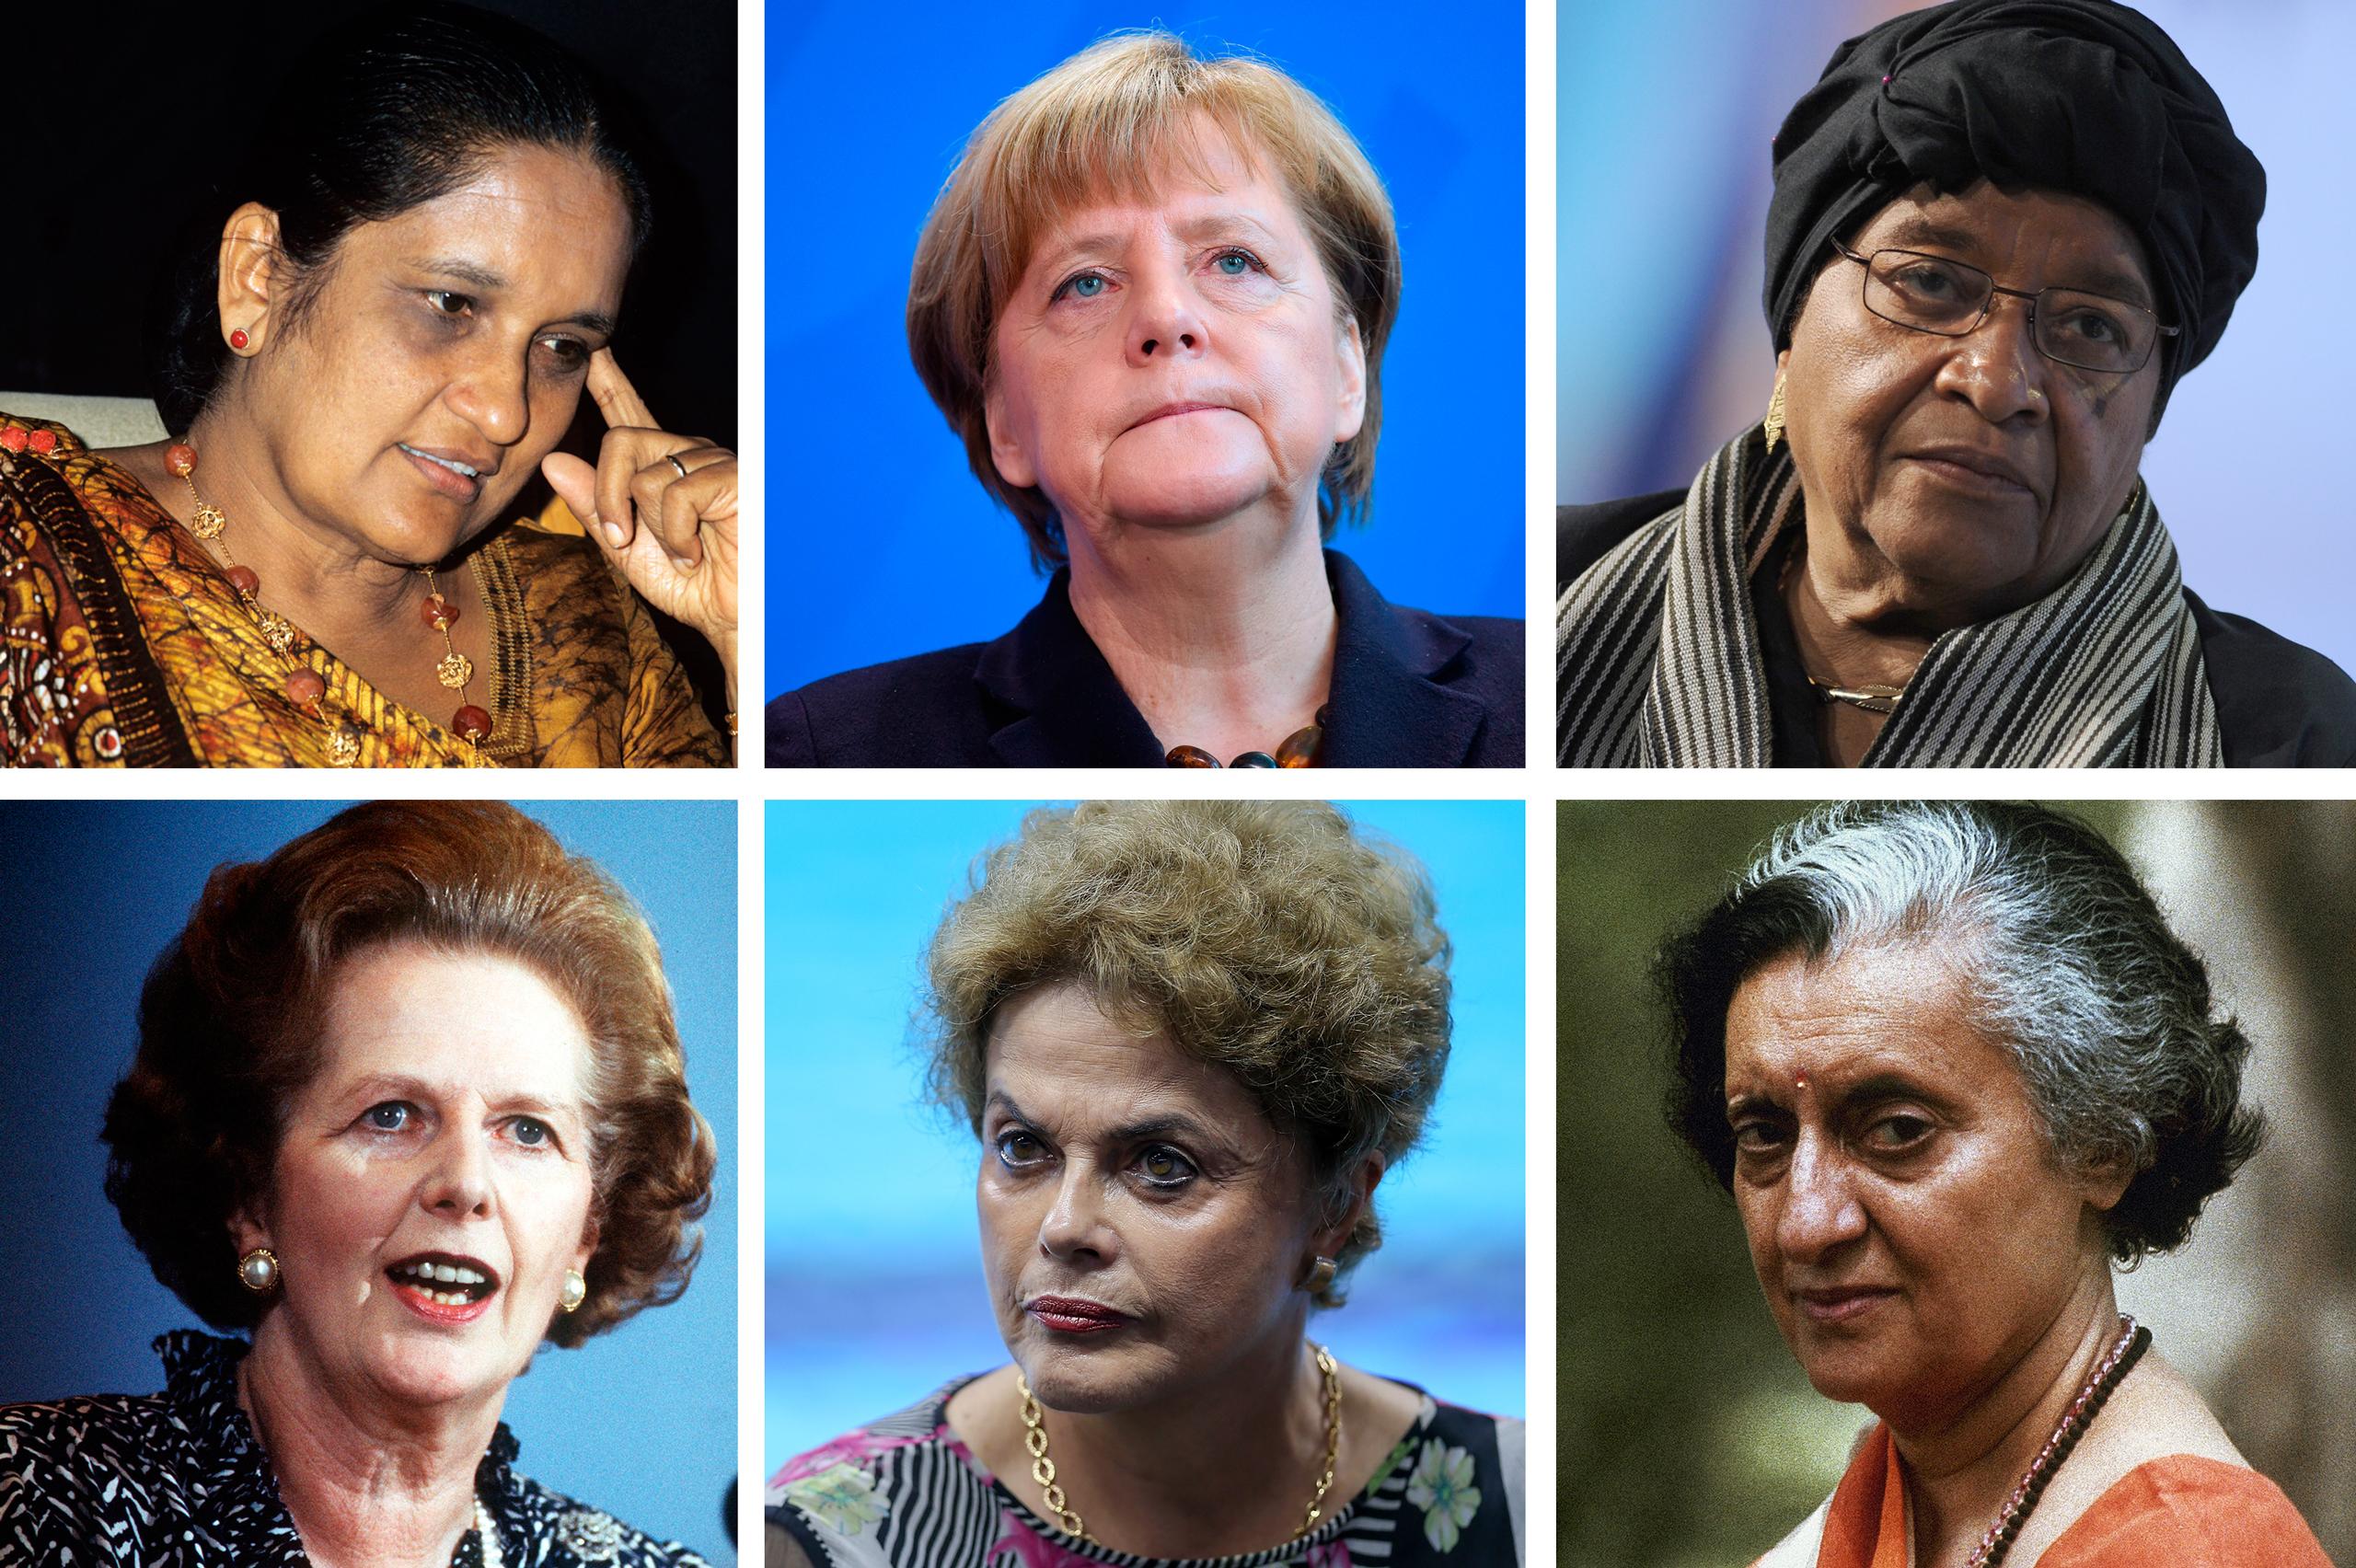 From top-left, clockwise: Sirimavo Bandaranaike, Sri Lanka; Angela Merkel, Germany; Ellen Johnson-Sirleaf, Liberia; Indira Gandhi, India; Dilma Rousseff, Brazil; Margaret Thatcher, Britain.